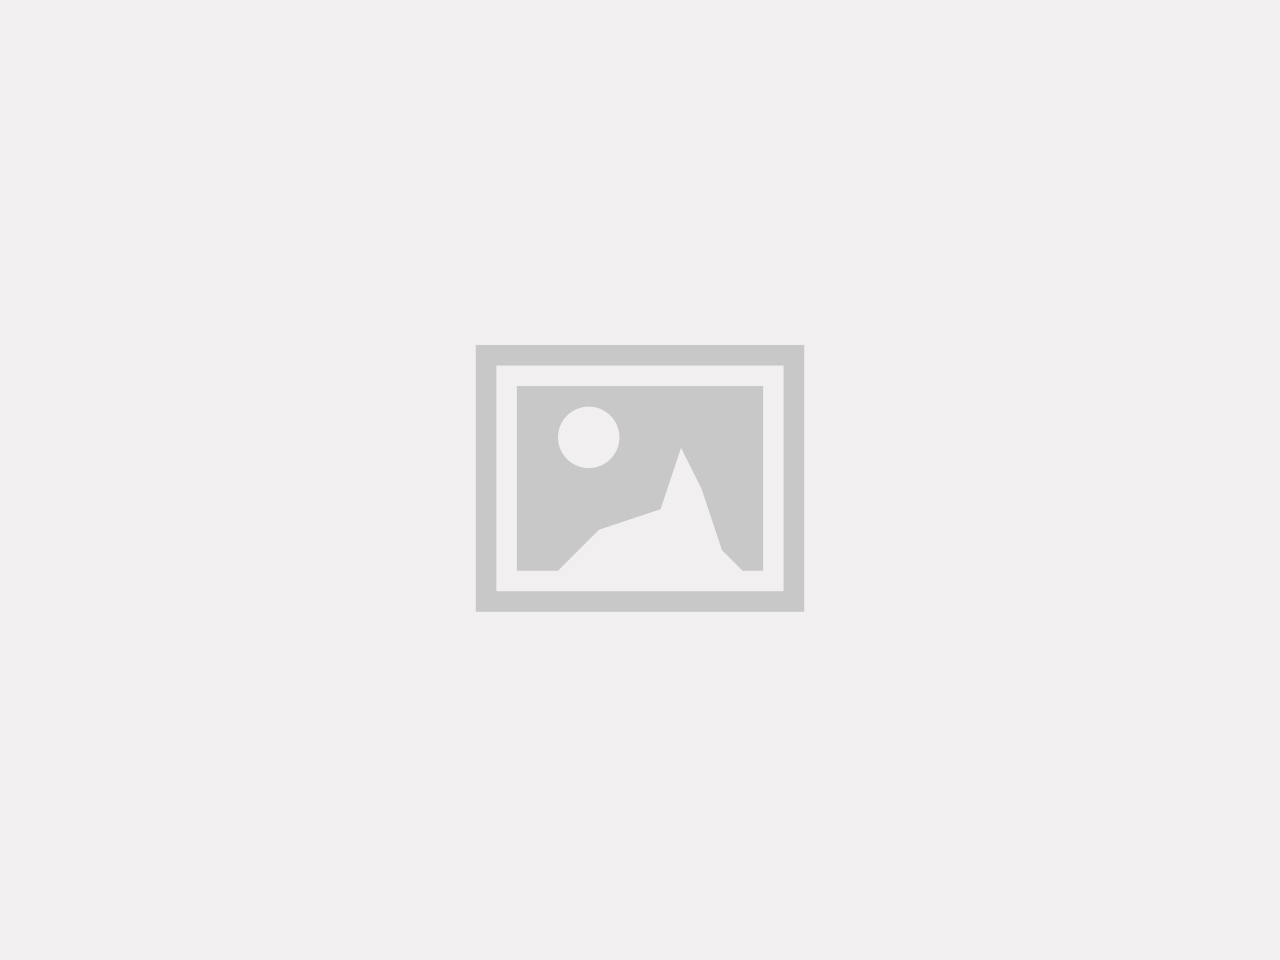 Trådlöst HDMI 30m, H.264, 1080p, Mottagare